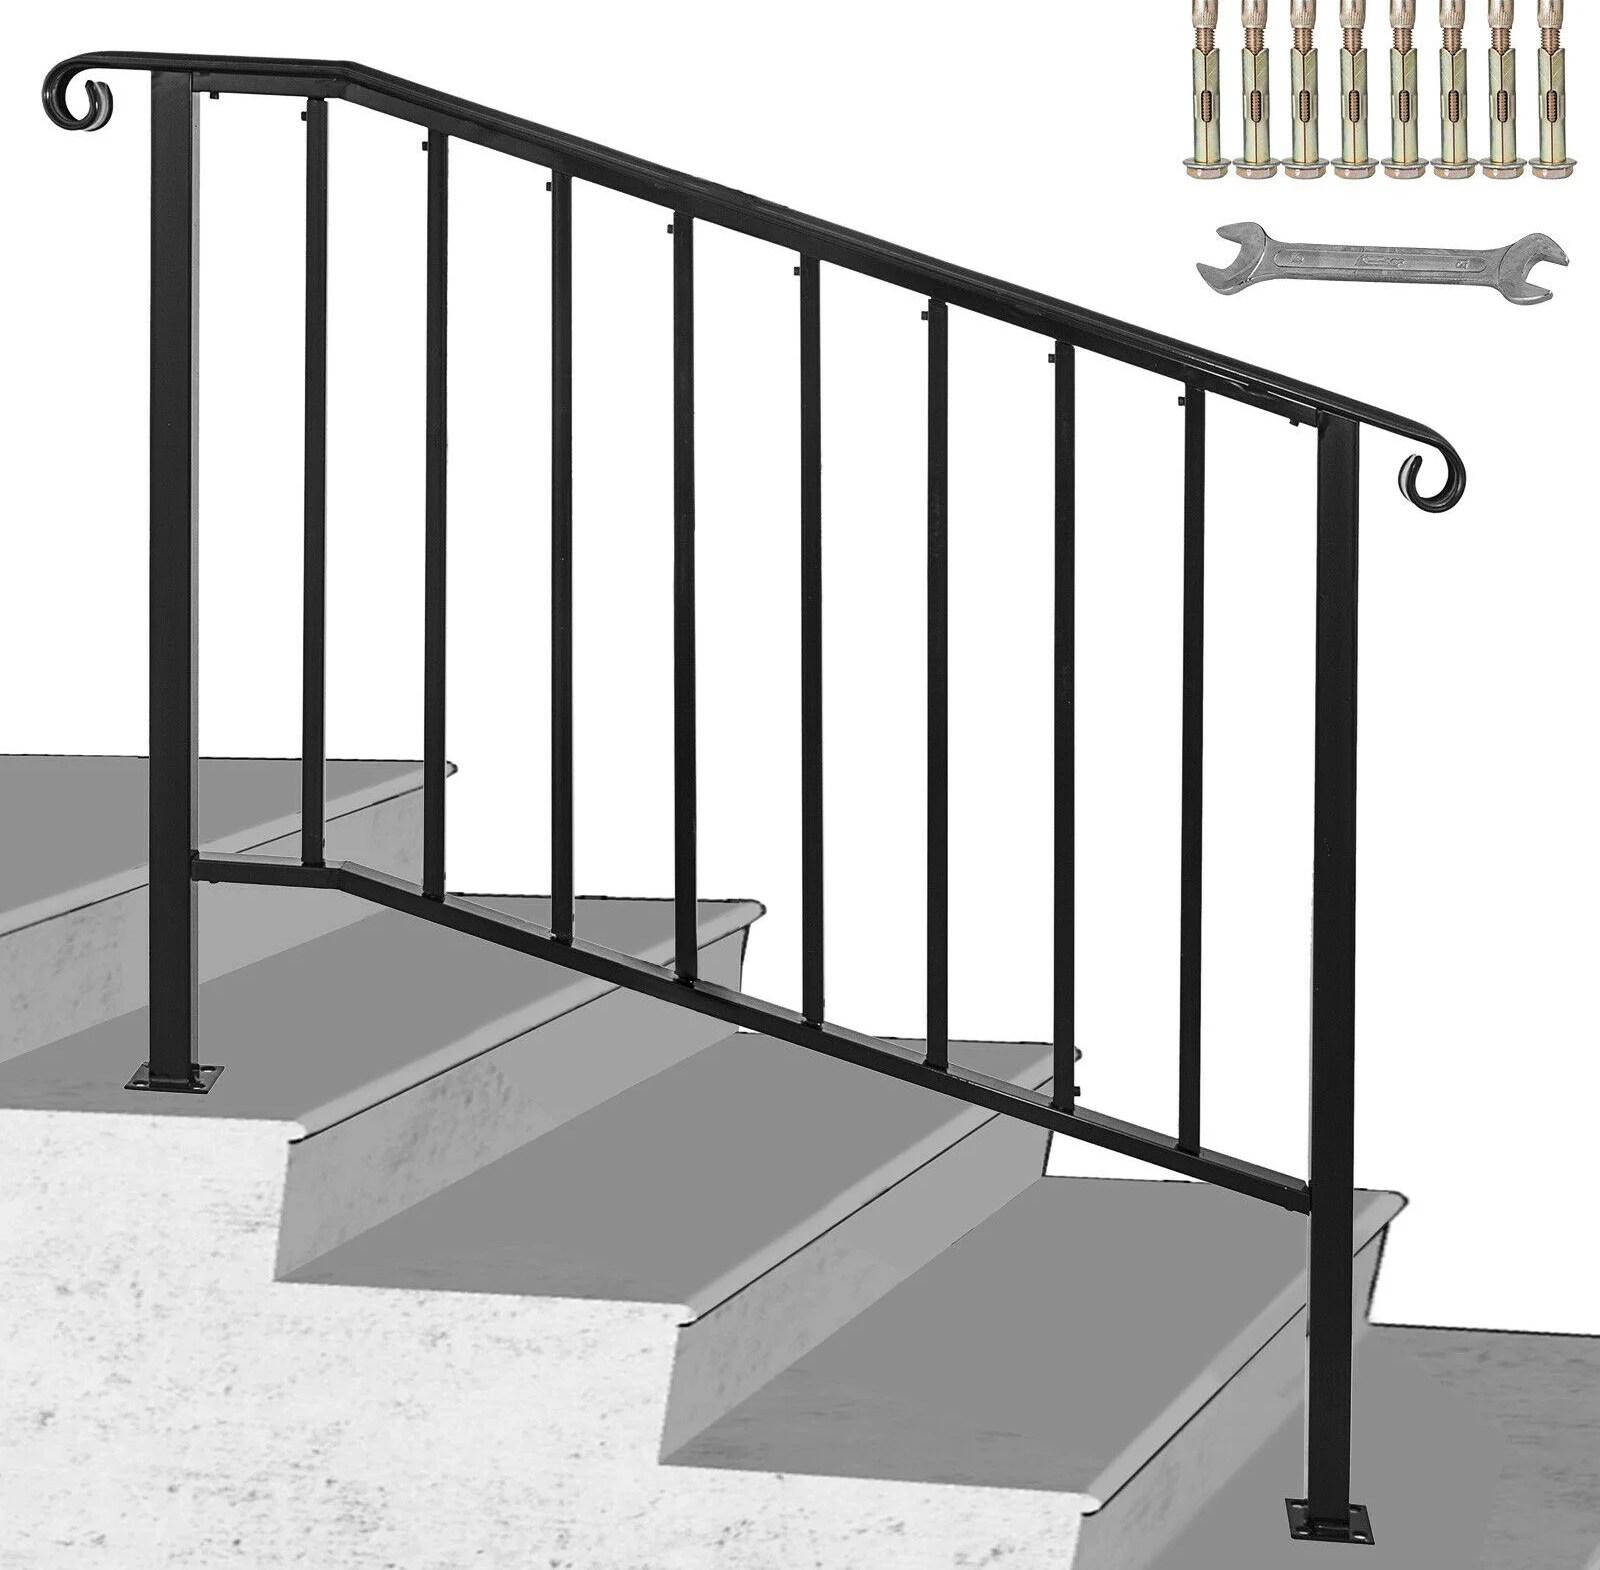 Vevor Handrail Picket 3 Fits 3 Or 4 Steps Walmart Com Walmart Com | 3 Step Stair Railing | Manufactured Home | Basic Deck | Residential Stair | 2 Bar | Three Step